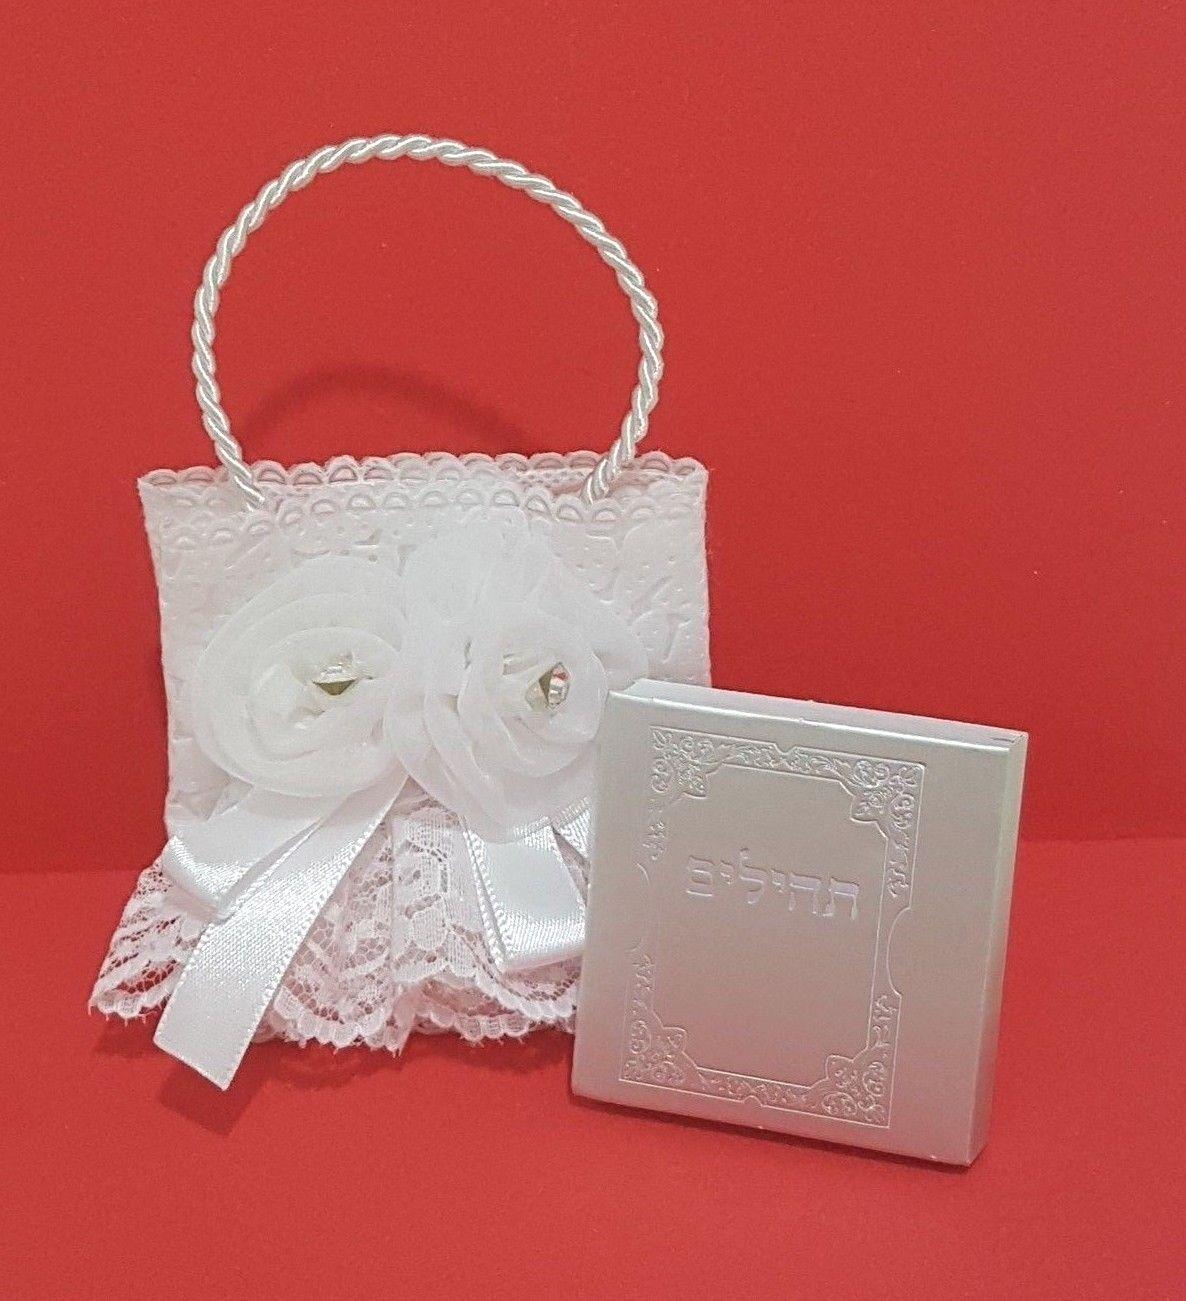 Jewish Newborn Gift Mini Basket with PSALMS tehillim Book Ev